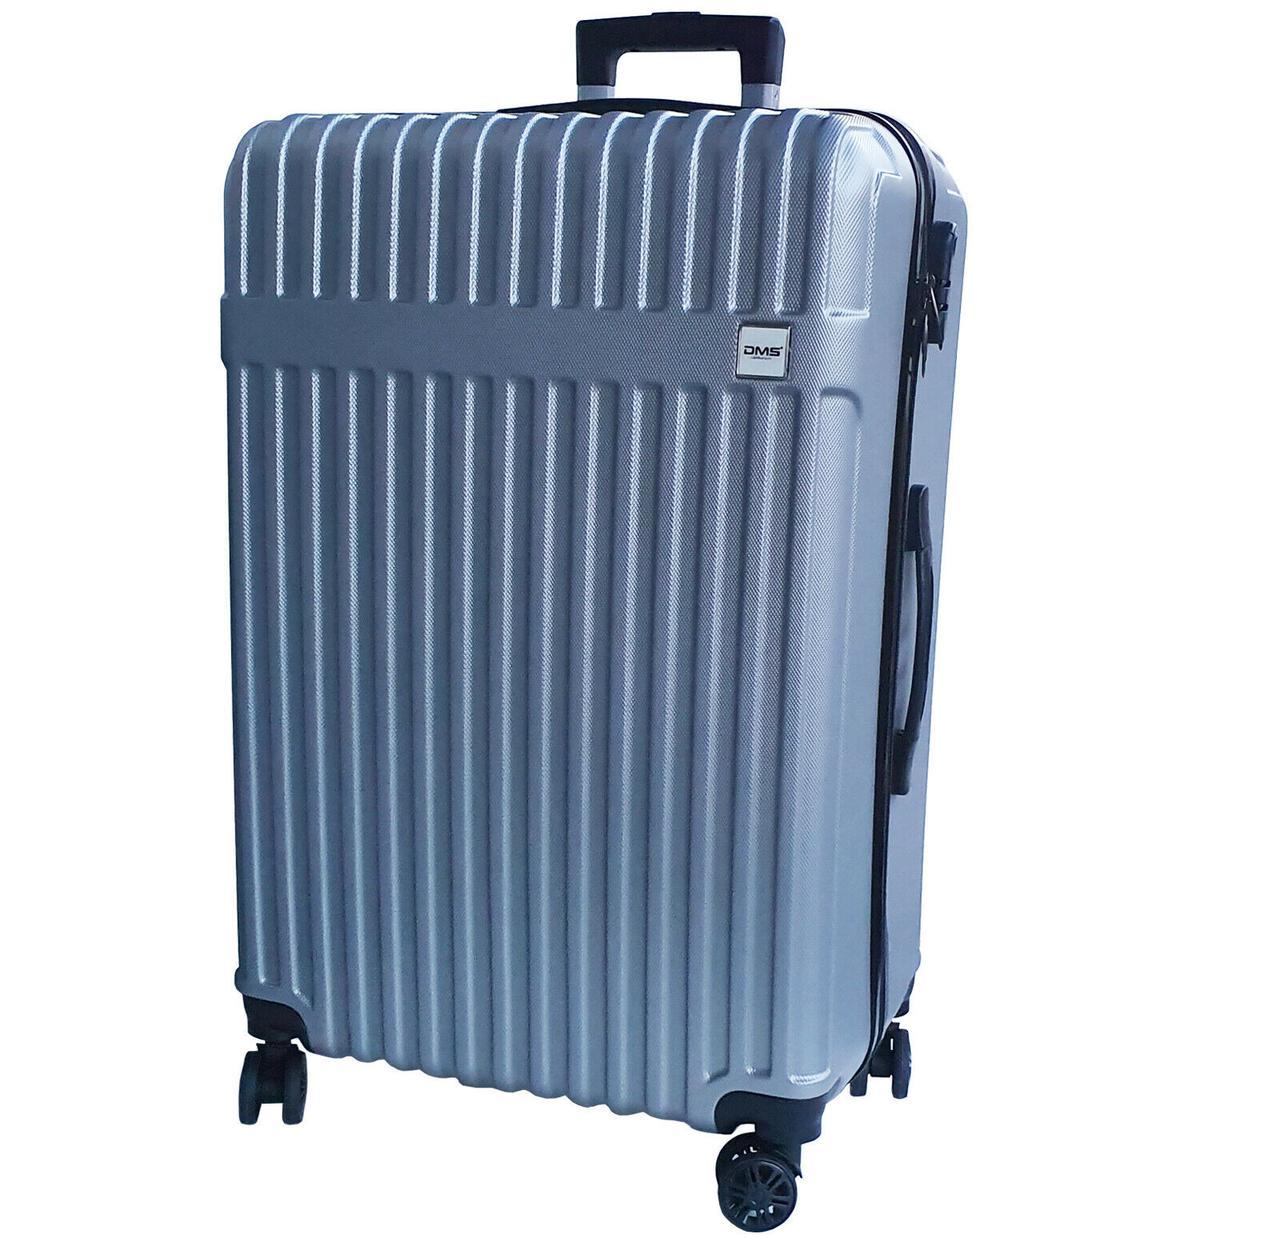 Чемоданы дорожные DMS с тележкой, размер XL: 124L, 77 x 52 x 32 см  серый Silver